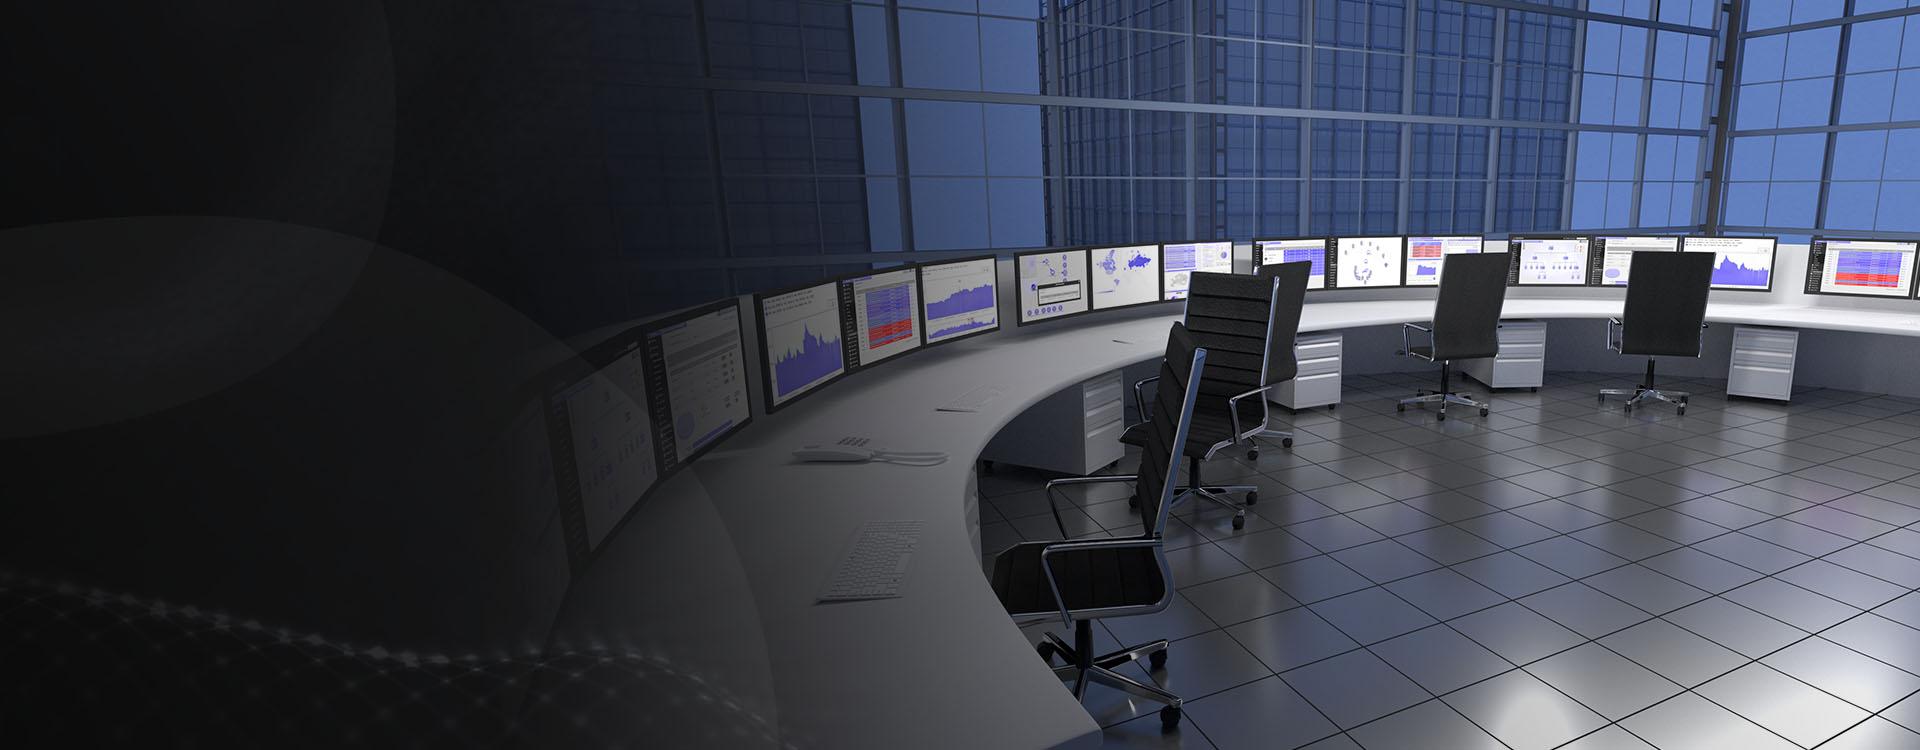 control-room-console